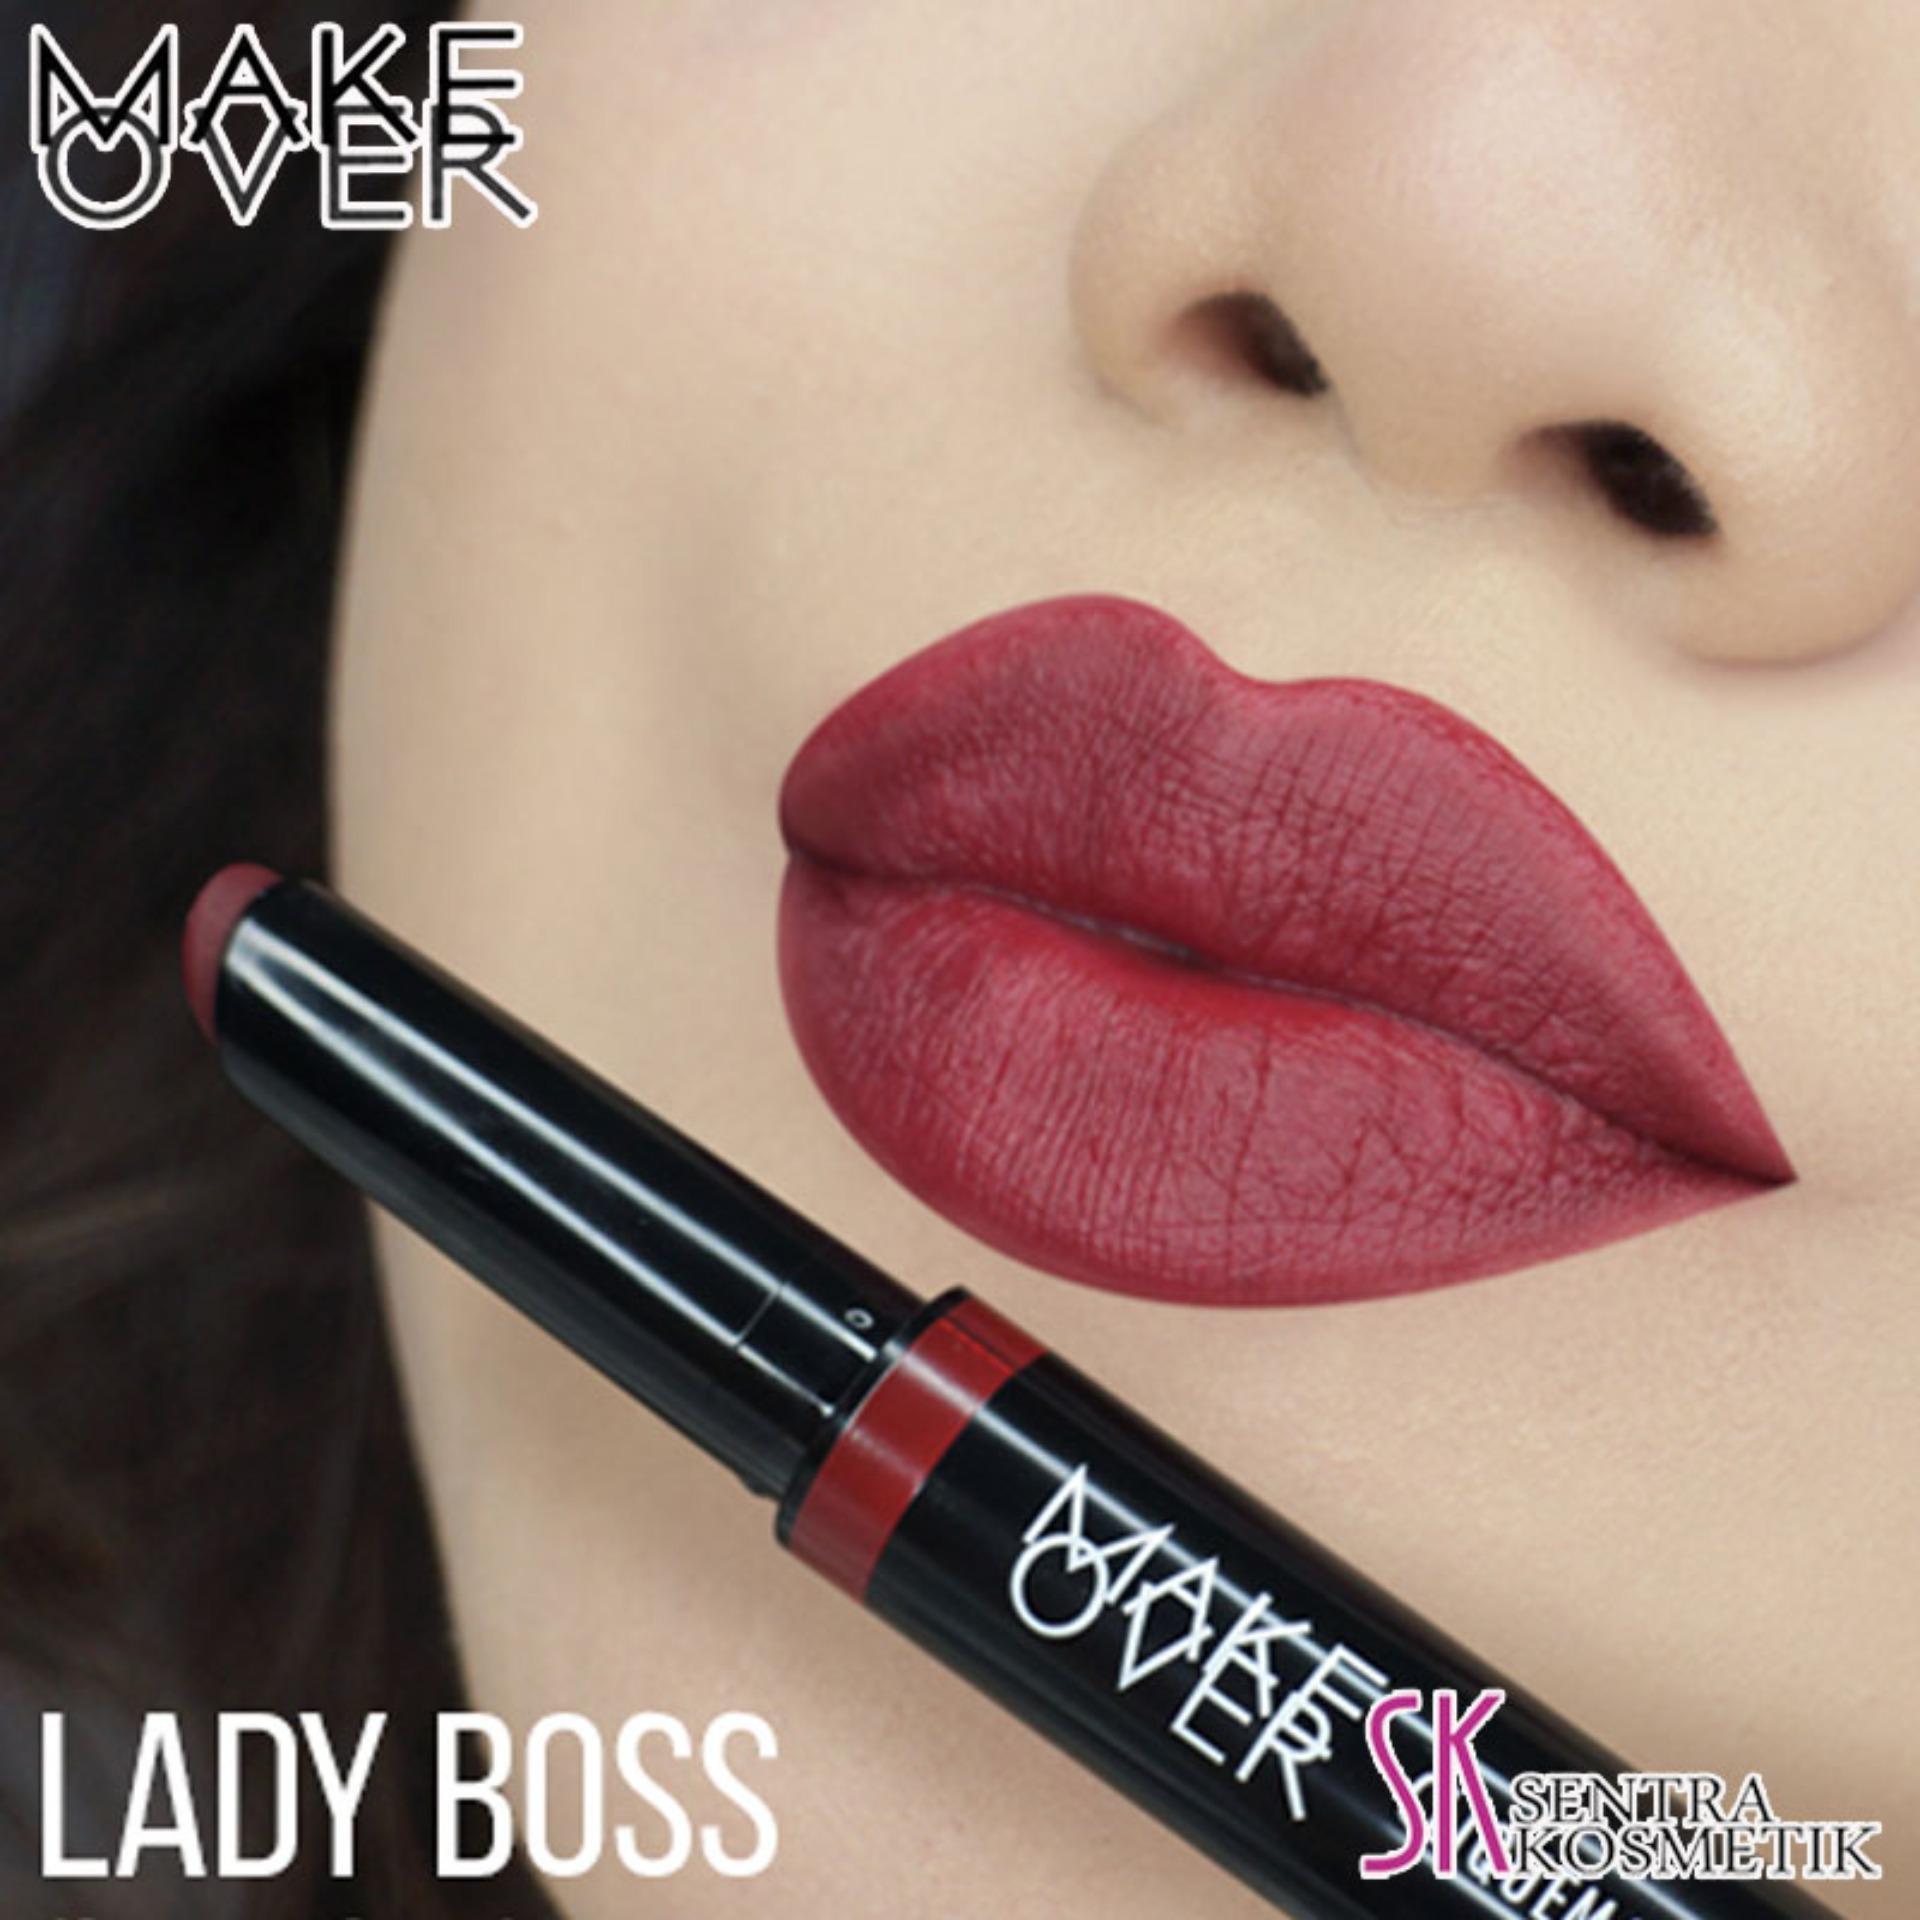 Jual Lipstik Make Over Terbaik Makeover Intense Matte Lip Cream Lipstick Cliquematte Stylo 207 Ladyboss